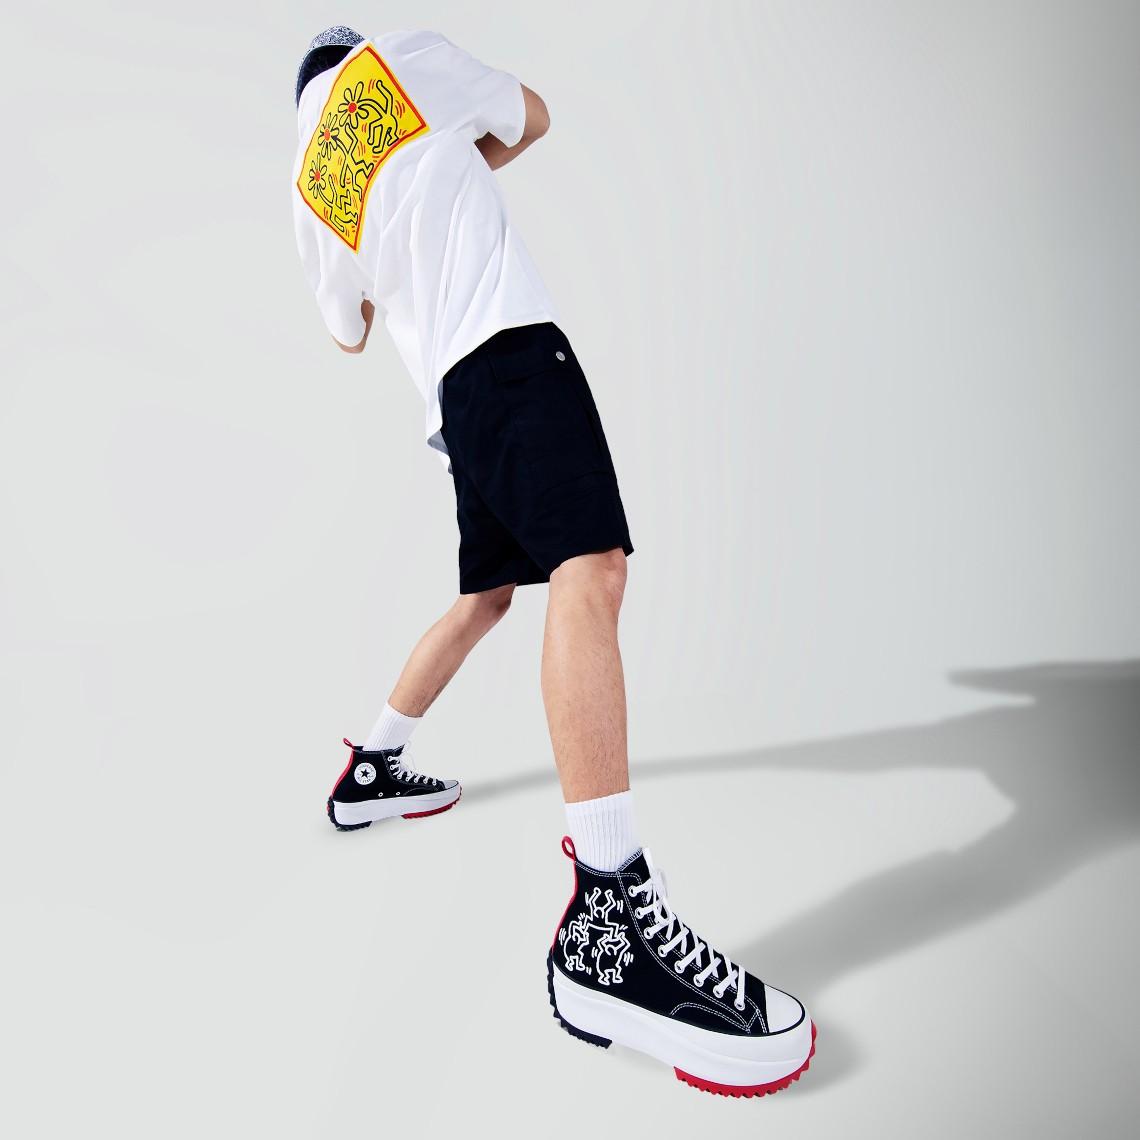 Converse,Keith Haring  艺术家联名又来了!全新 Keith Haring x Converse 联名曝光!